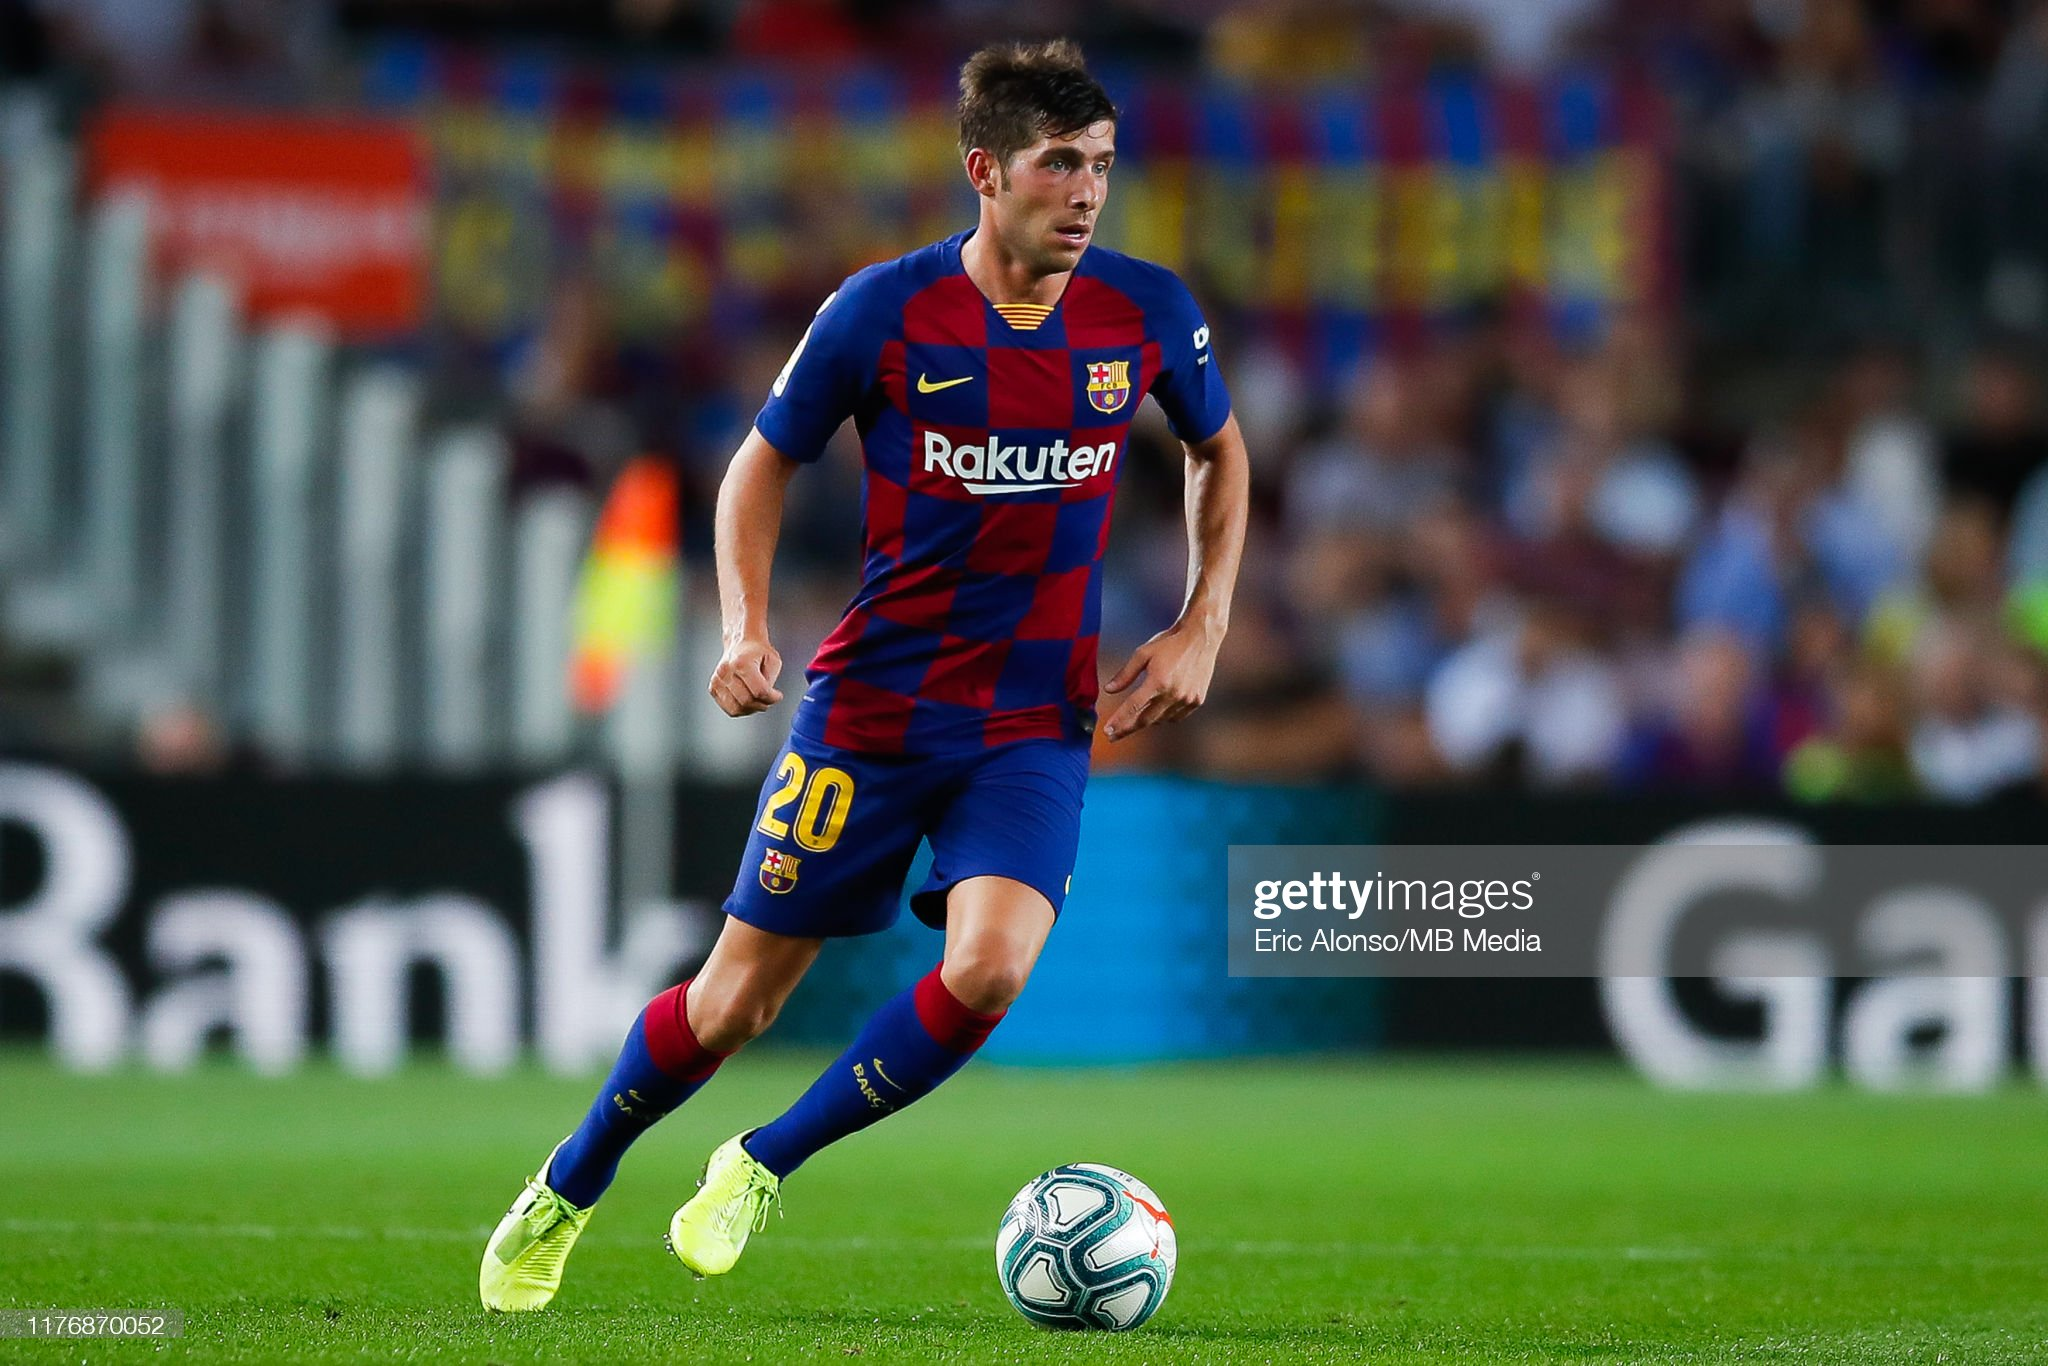 صور مباراة : برشلونة - فياريال 2-1 ( 24-09-2019 )  Sergi-roberto-of-fc-barcelona-passes-the-ball-during-the-liga-match-picture-id1176870052?s=2048x2048